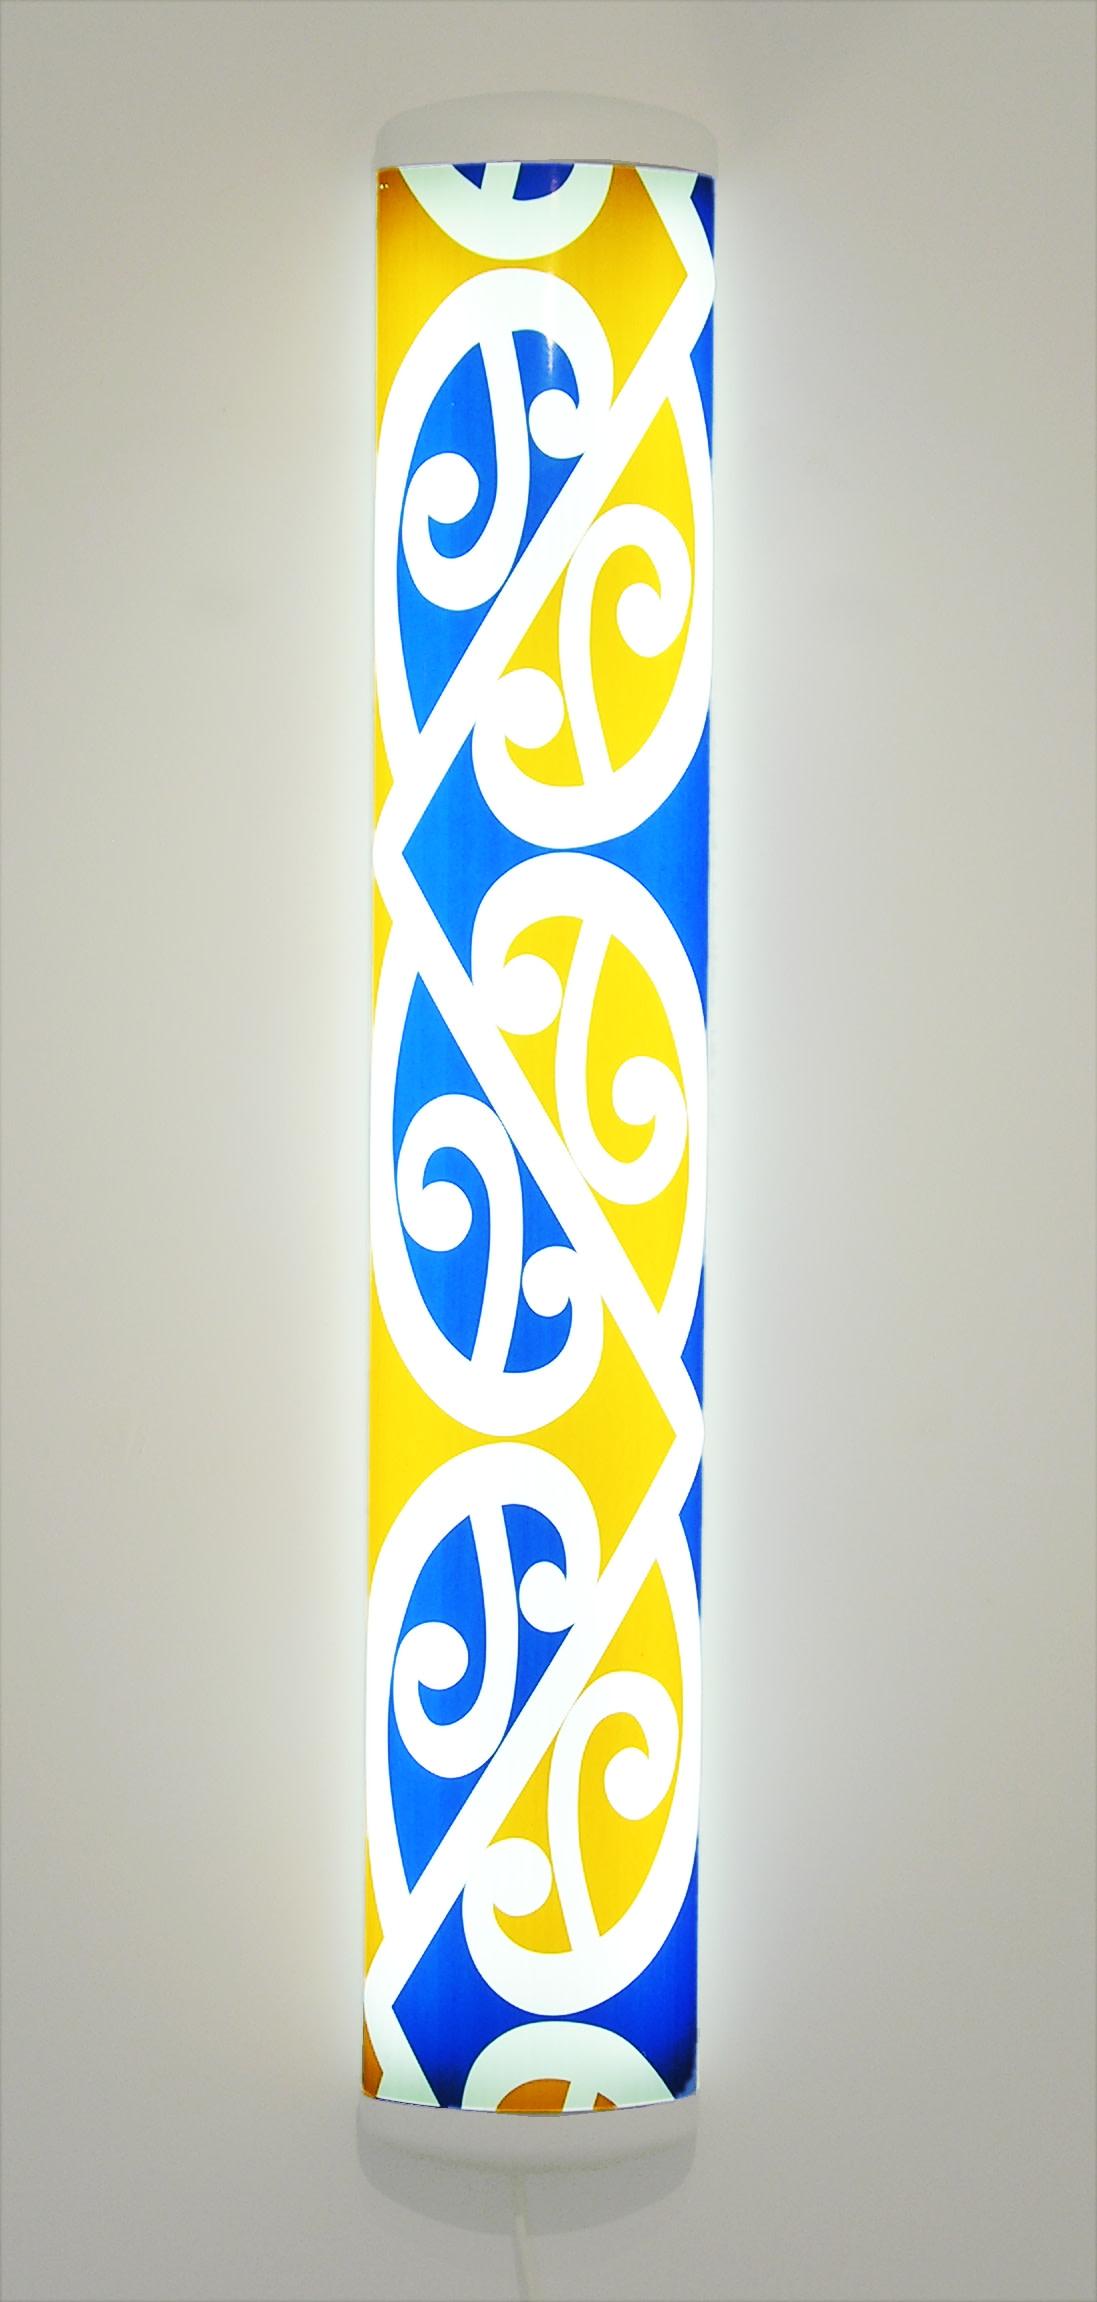 <span class=&#34;link fancybox-details-link&#34;><a href=&#34;/artists/81-michael-parekowhai/works/3062-michael-parekowhai-the-bosom-of-abraham-2001/&#34;>View Detail Page</a></span><div class=&#34;artist&#34;><strong>Michael Parekowhai</strong></div> <div class=&#34;title&#34;><em>The Bosom of Abraham</em>, 2001</div> <div class=&#34;medium&#34;>Screenprinted vinyl on fluorescent light fitting</div> <div class=&#34;dimensions&#34;>51.2 x 8.3 x 2 in<br />130 x 21 x 5 cm</div>